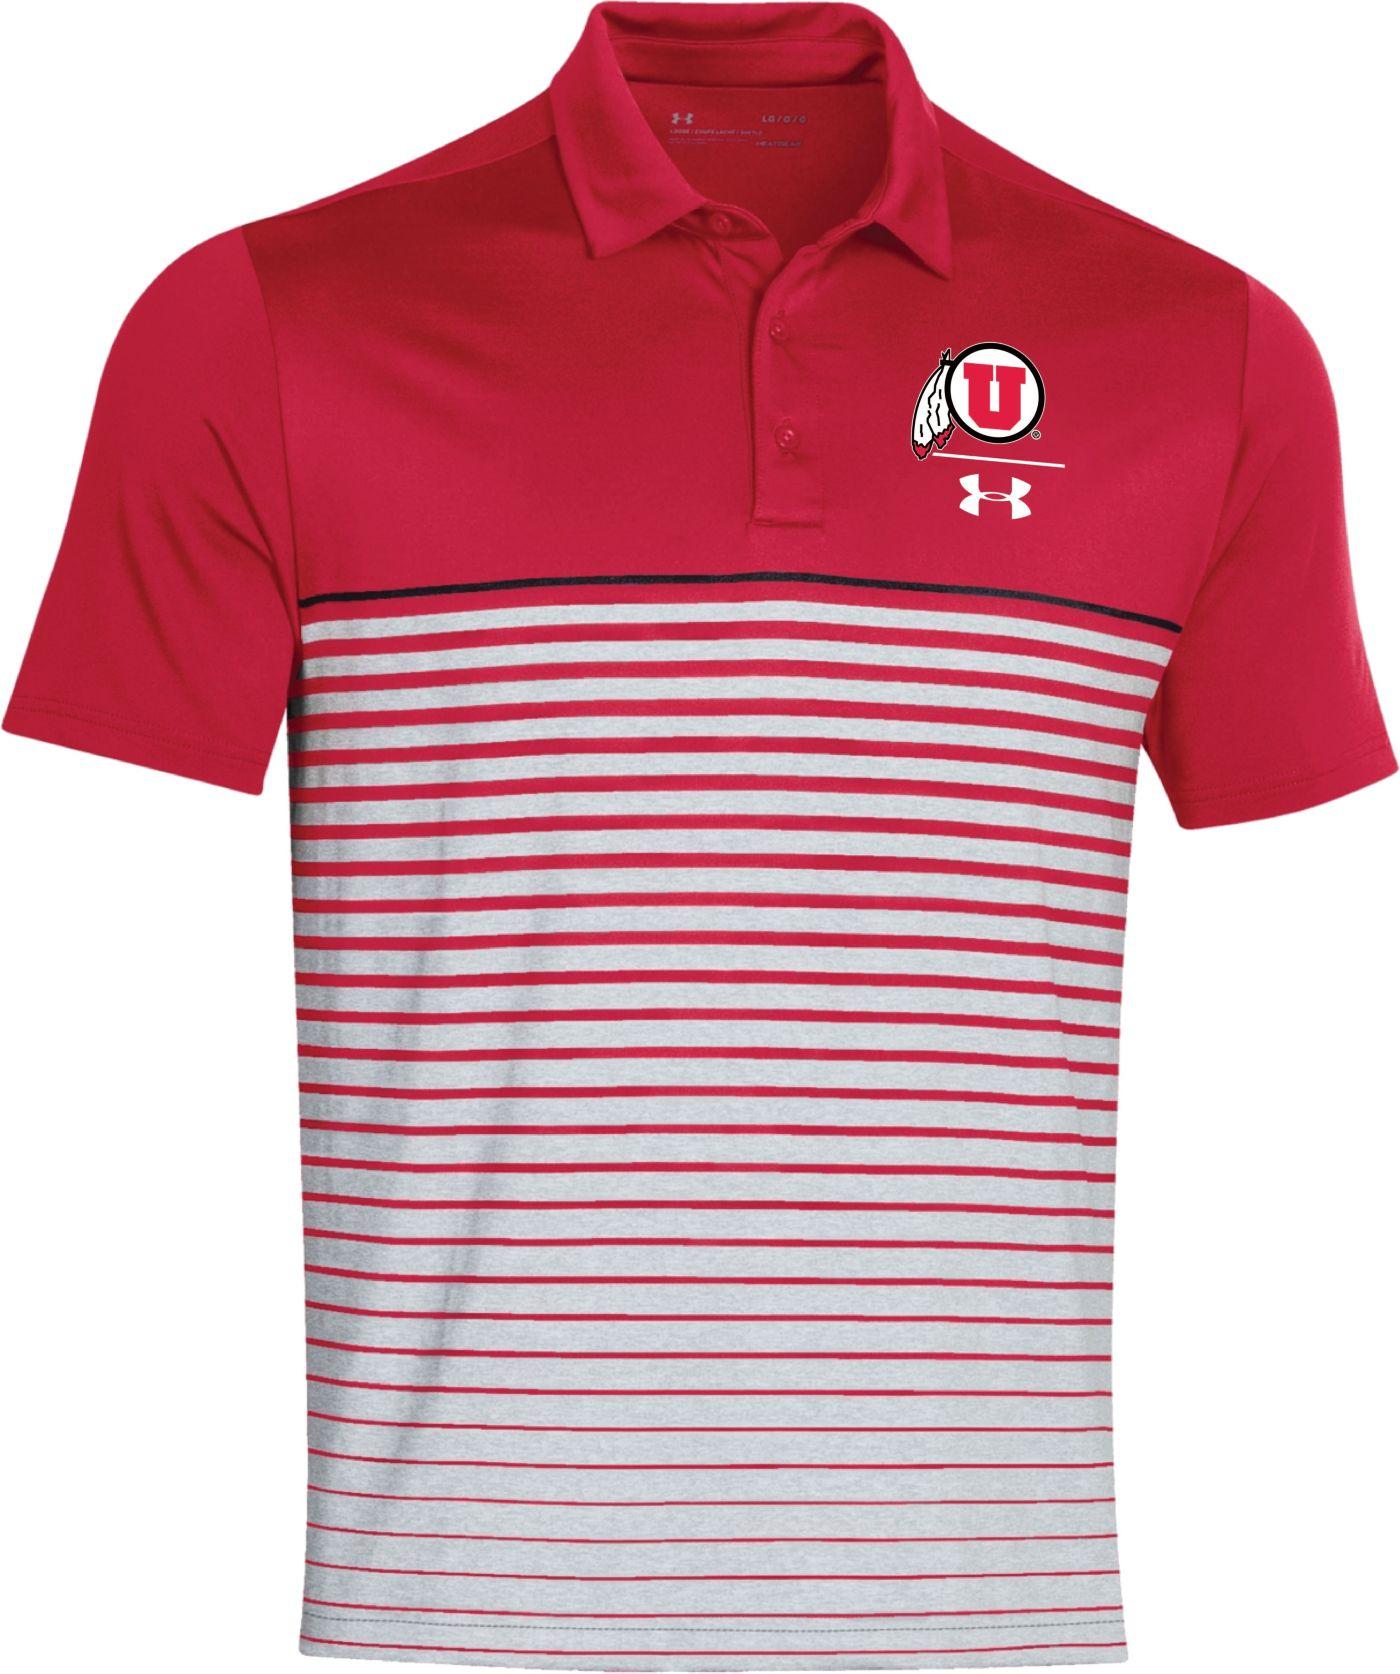 Under Armour Men's Utah Utes Crimson Pinnacle Performance Sideline Polo